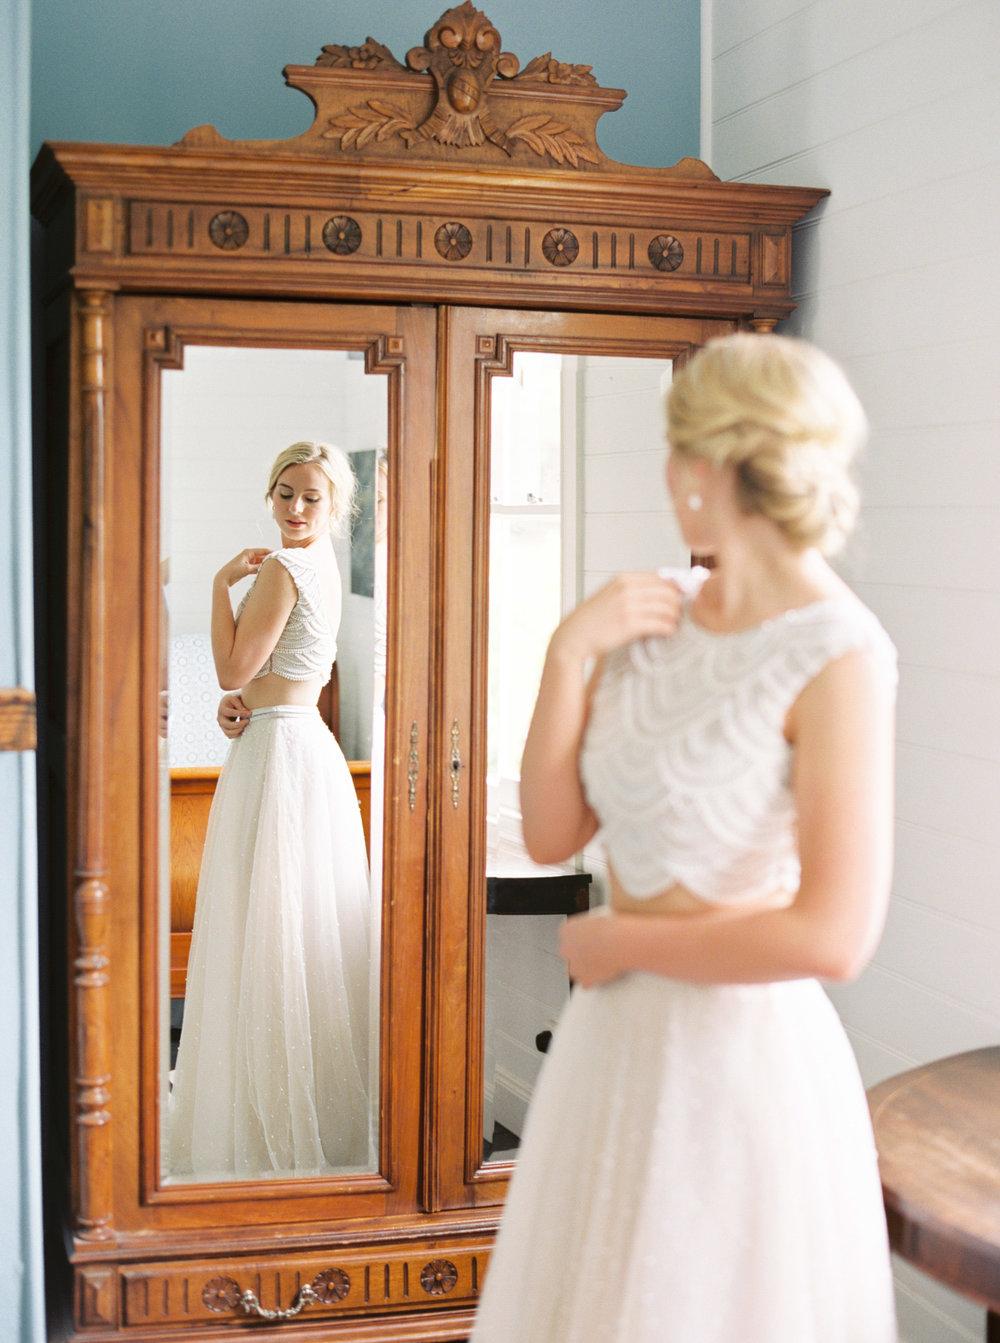 Timeless Southern Highland Wedding Elopement in Bowral NSW Fine Art Film Photographer Sheri McMahon-3.jpg